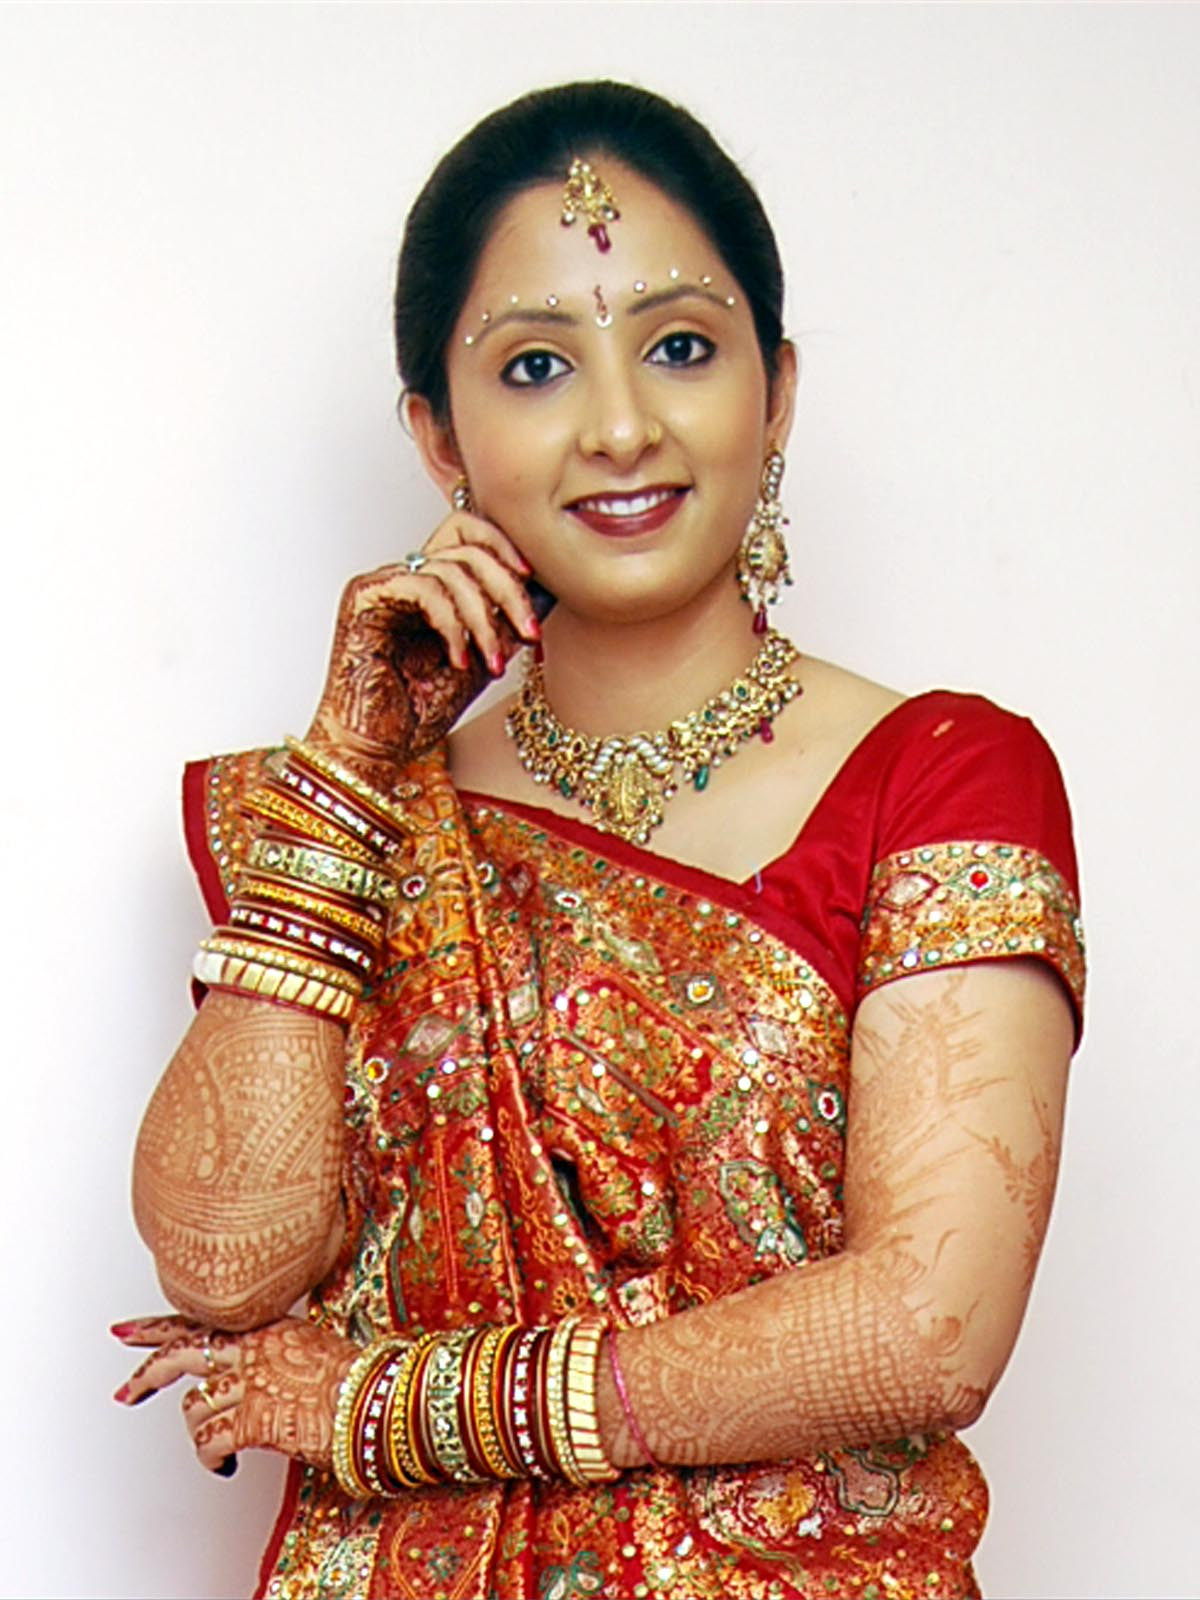 Indian bridal dress up